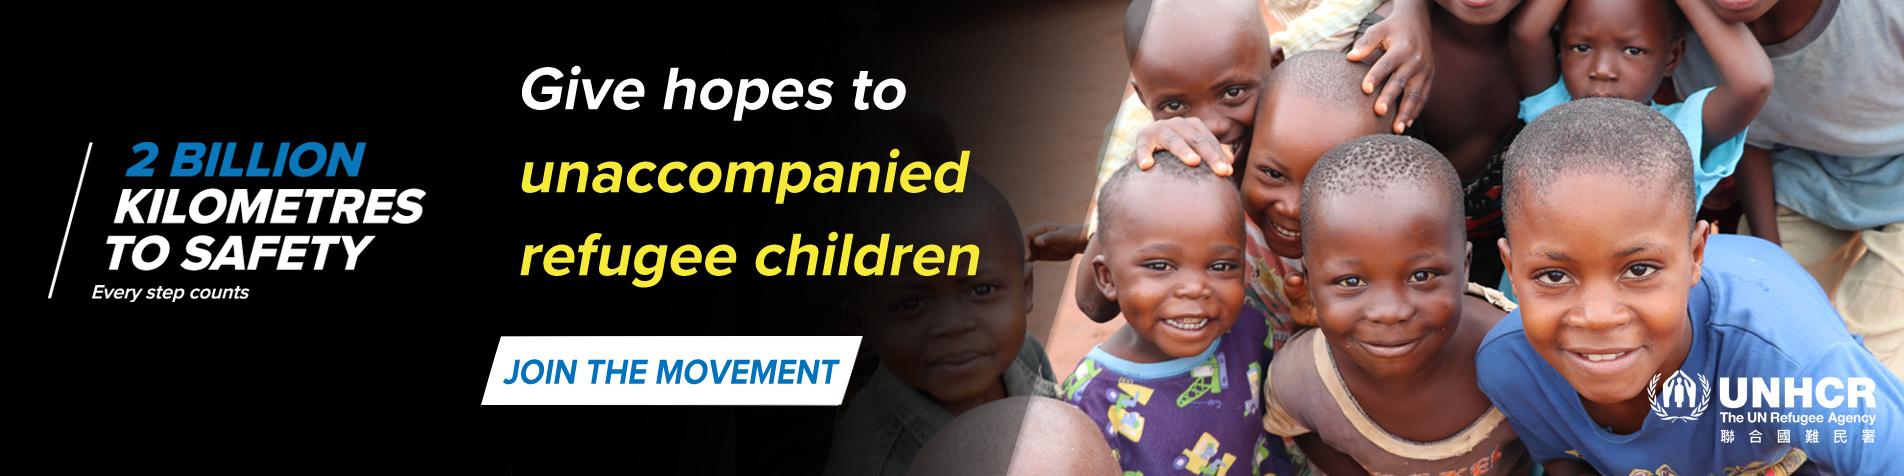 "UNHCR : ""2 BILLION KILOMETRES TO SAFETY"" for refugee children"